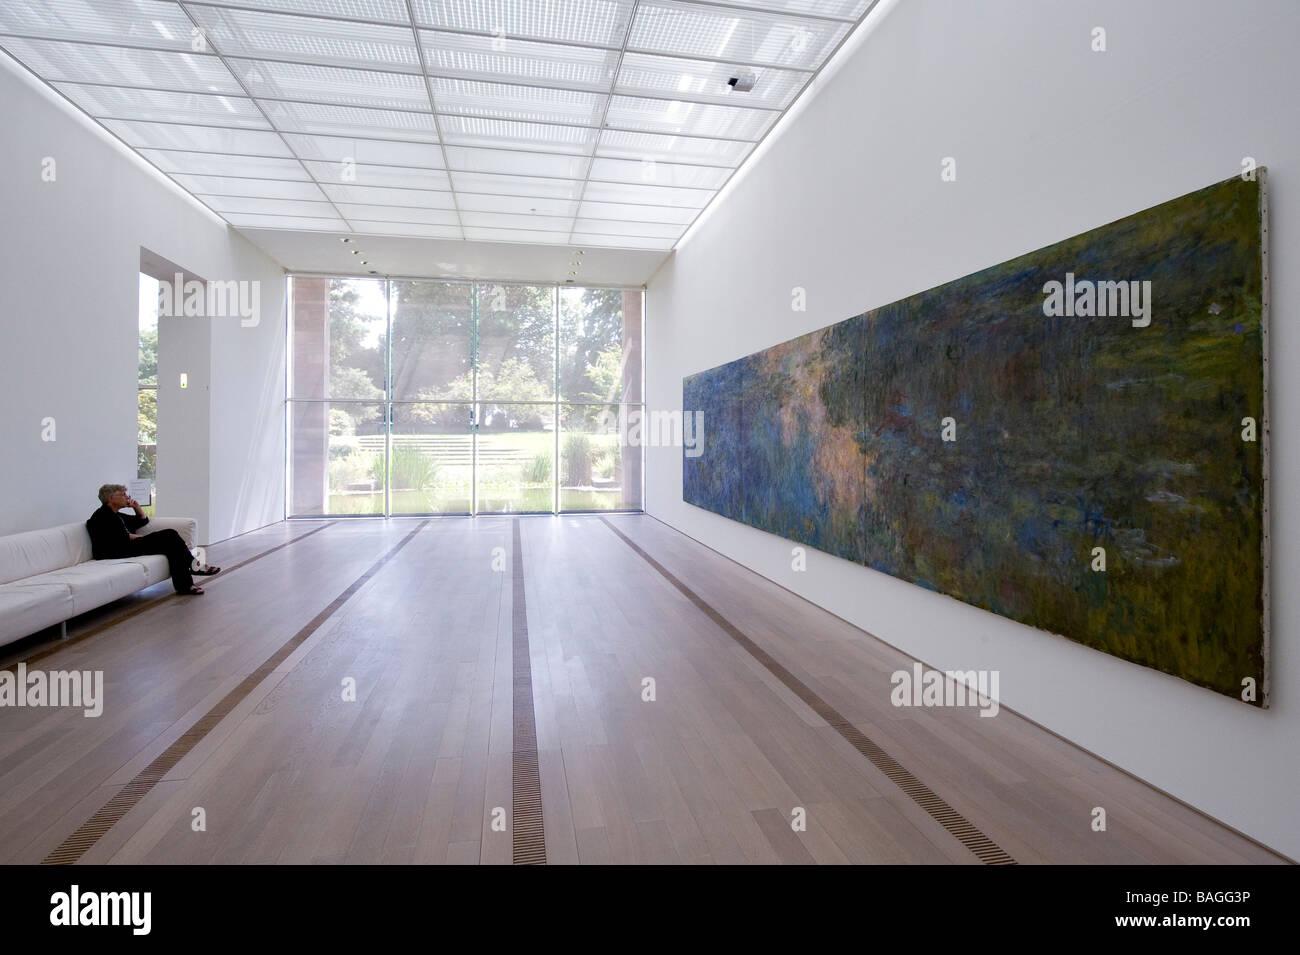 Switzerland, Basel, Fondation Beyeler, Water-Lili Pond by the painter Claude Monnet - Stock Image